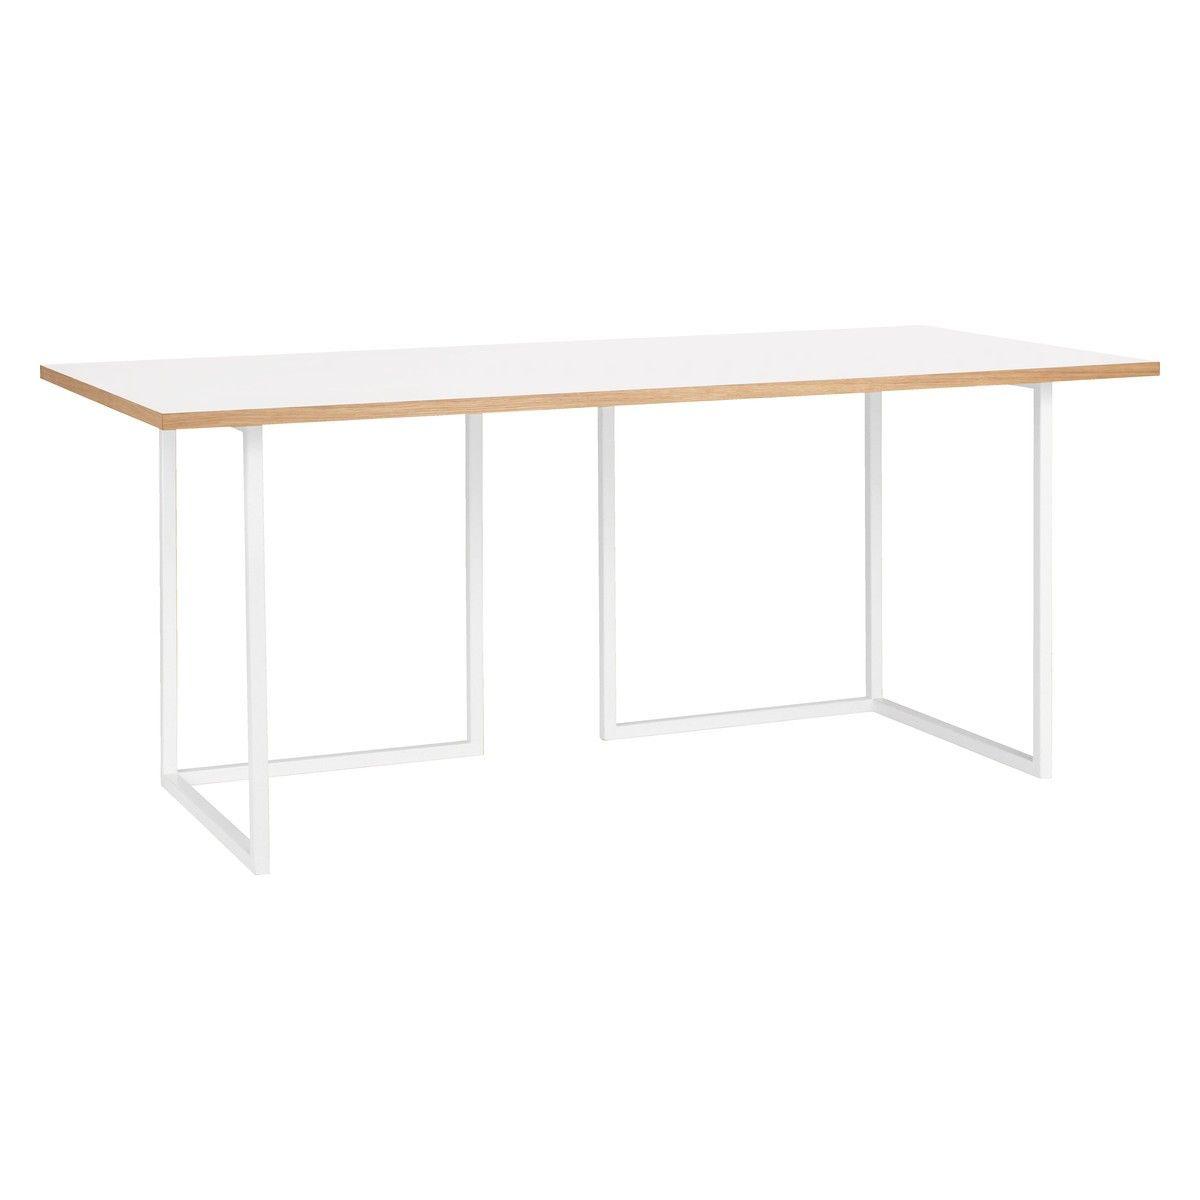 Nac White Laminate Desk With Trestles L180cm